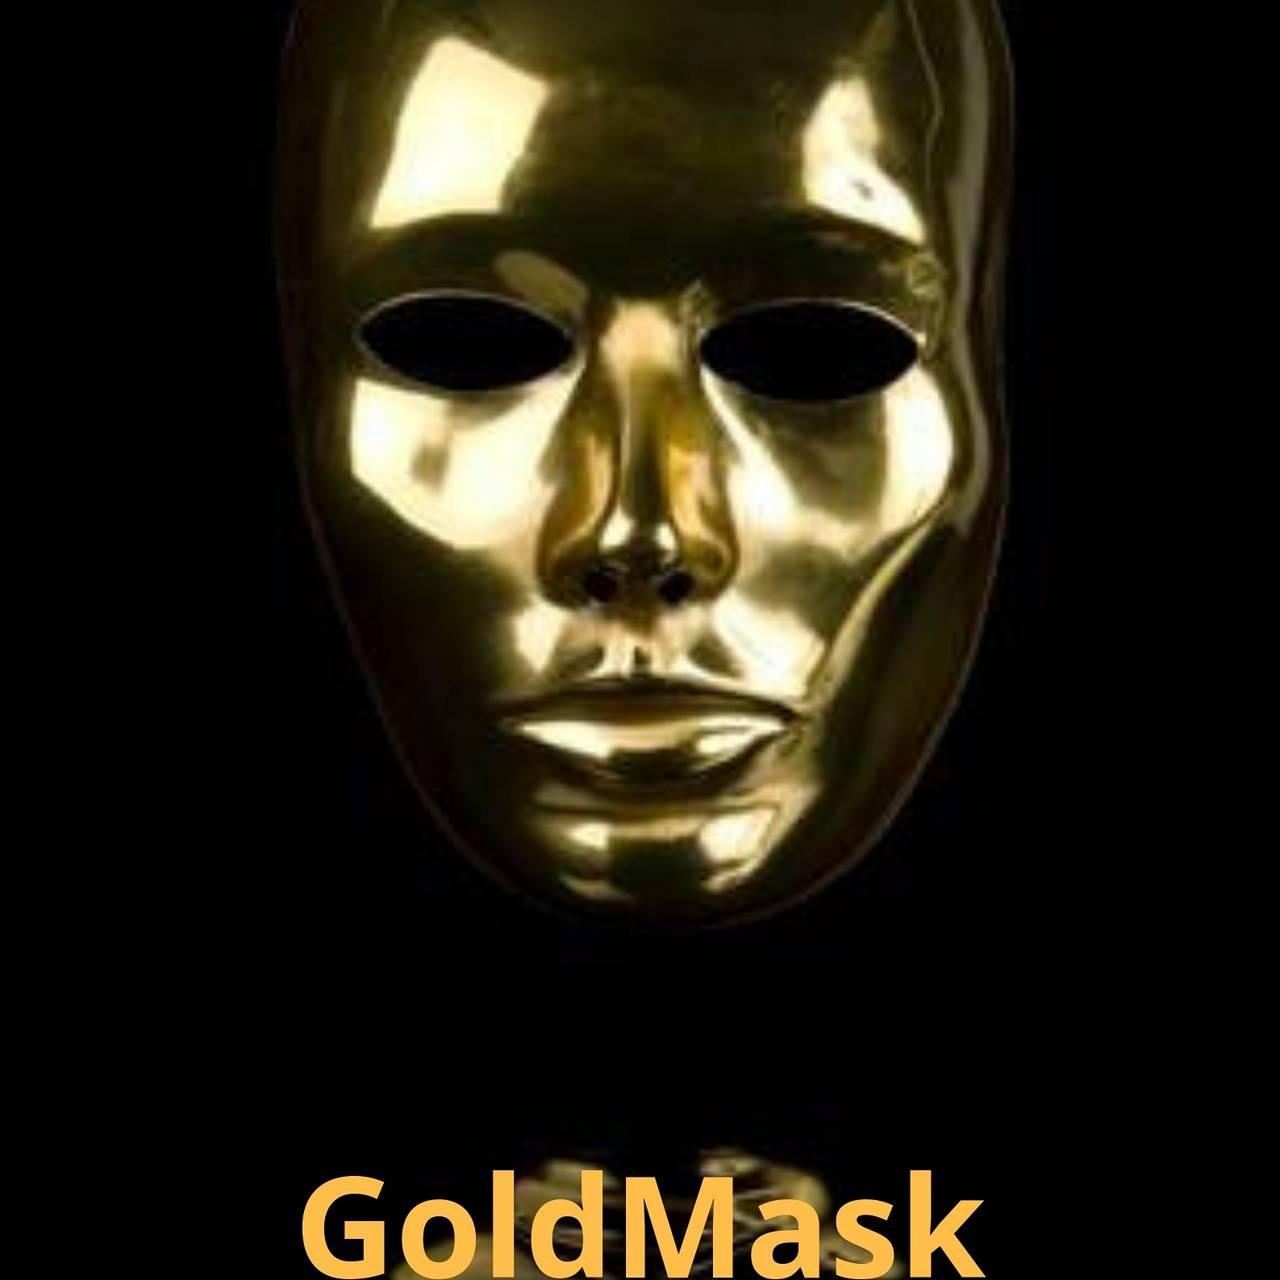 Goldmask member